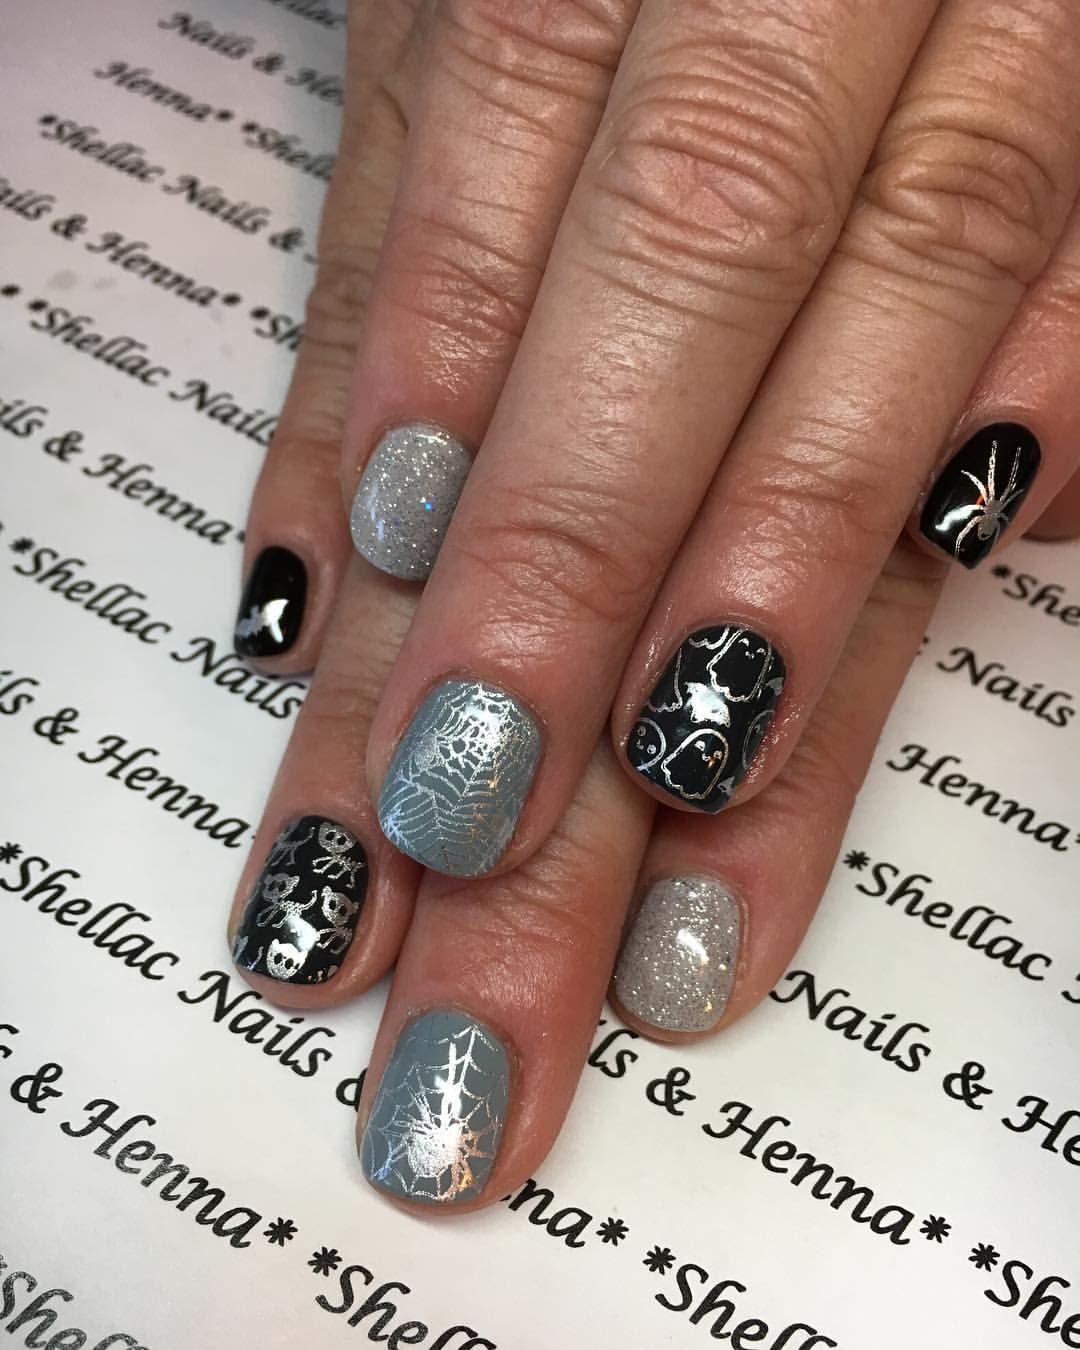 17 Likes, 1 Comments - Shellac Nails & Henna (@shellac ...